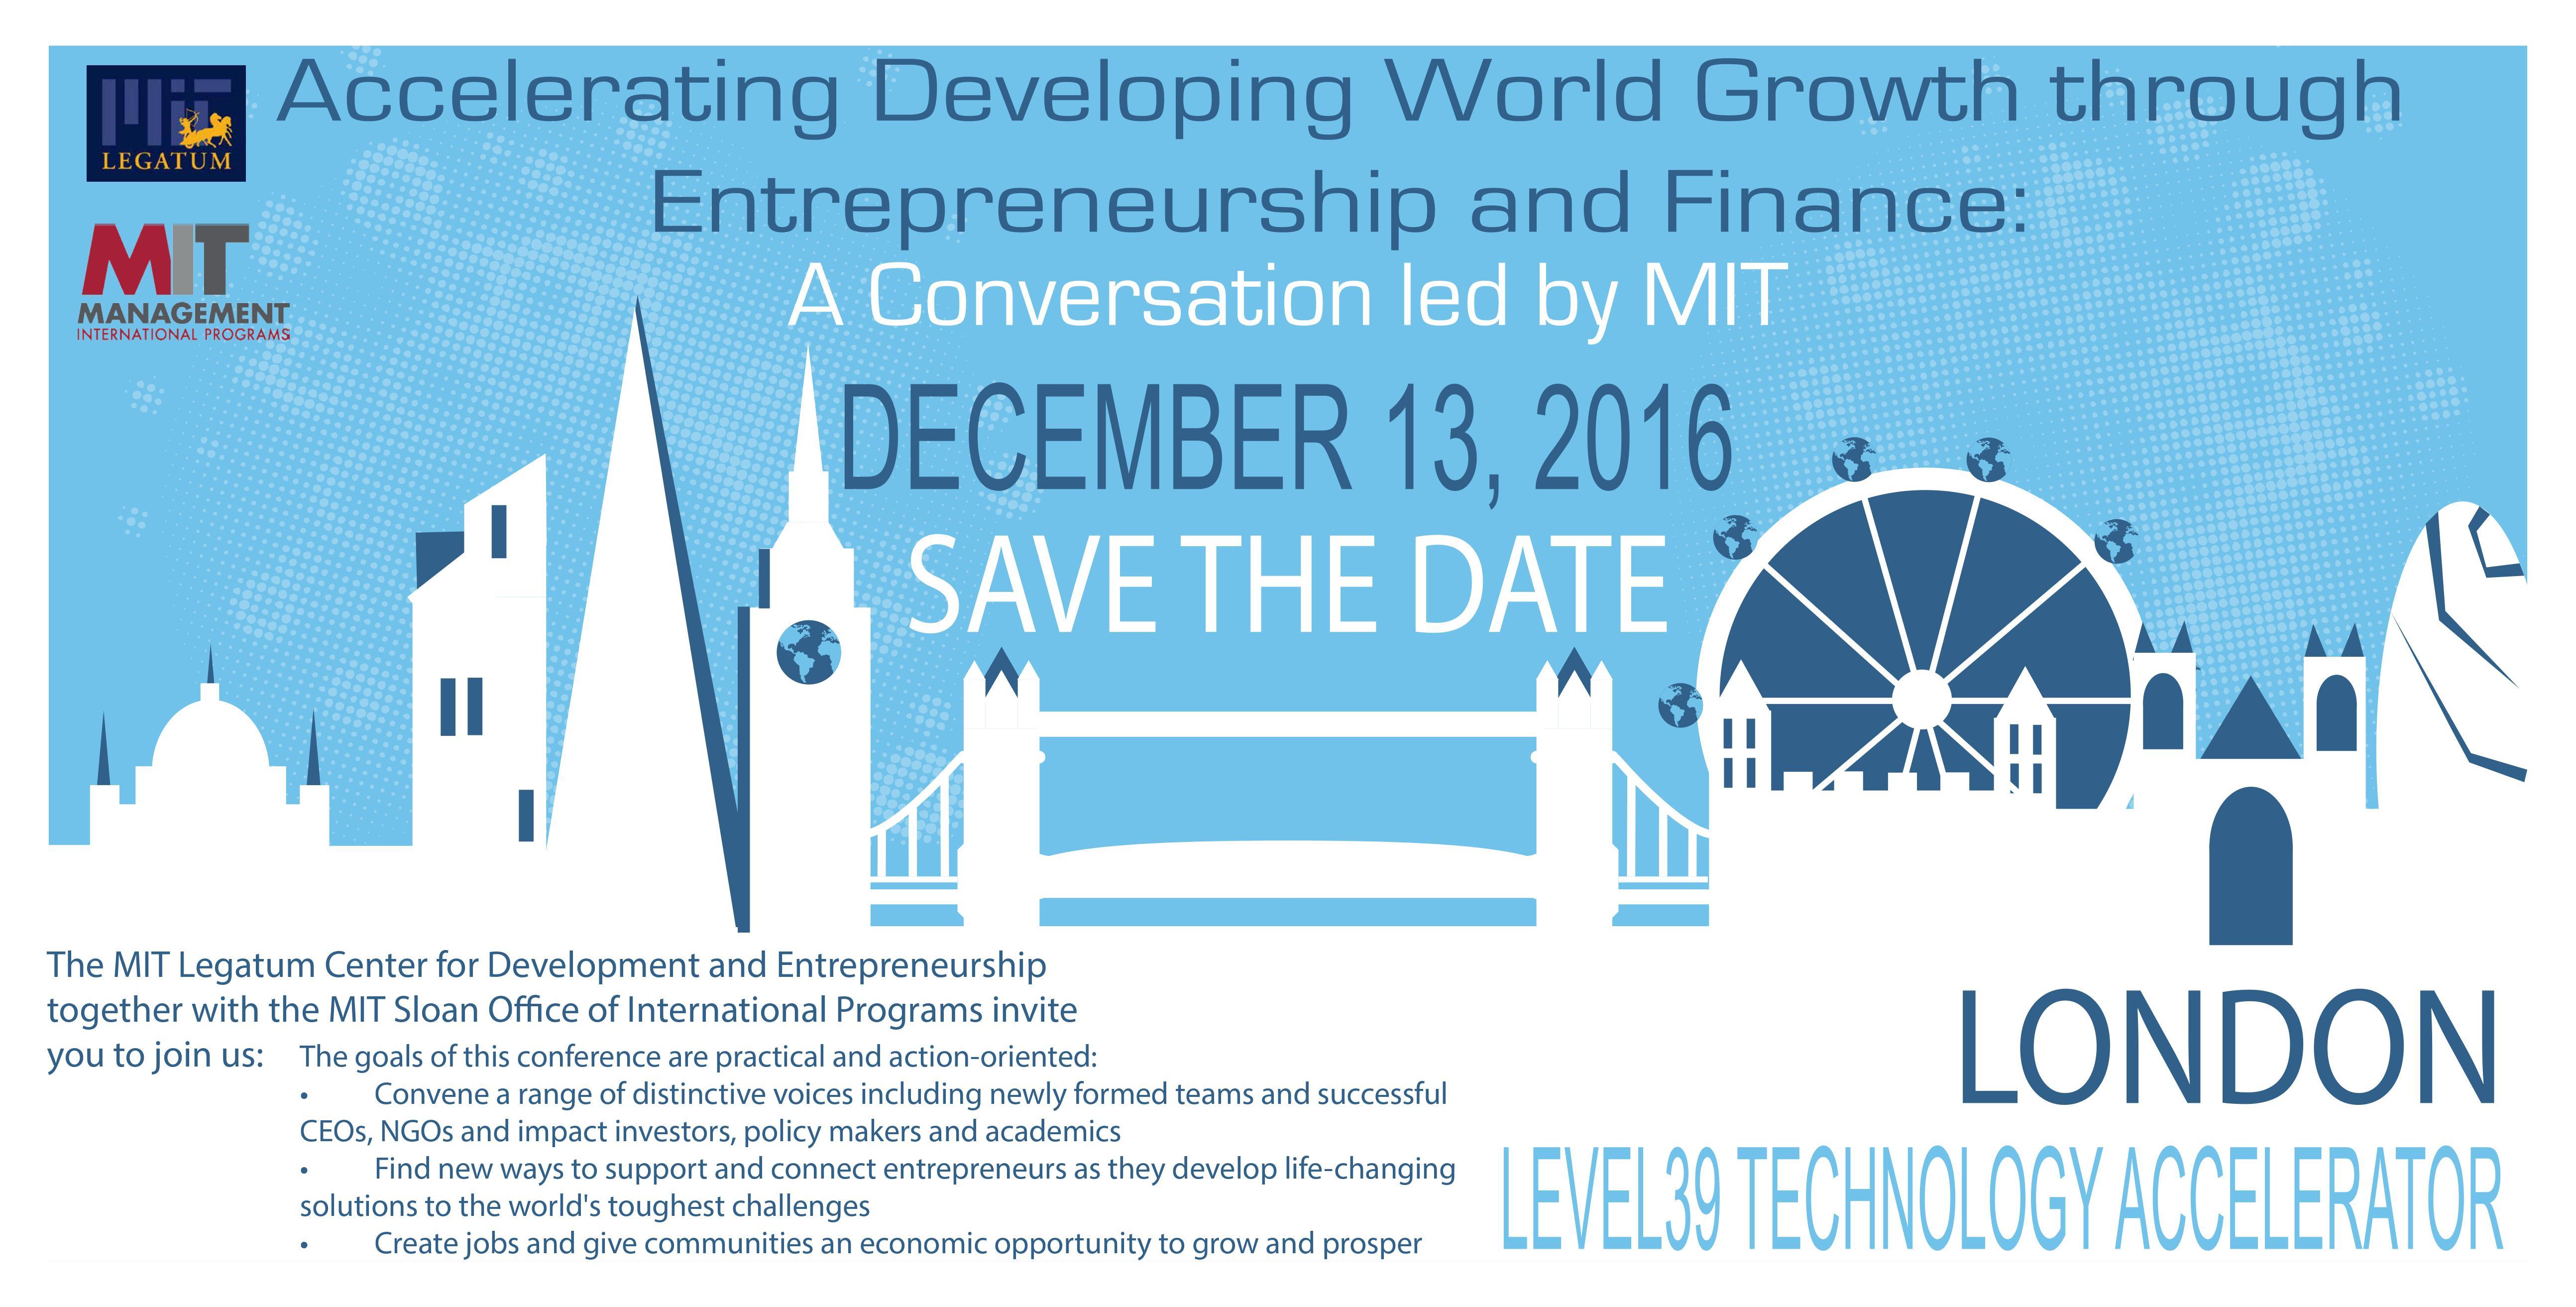 Accelerating Developing World through Entrepreneurship and Finance